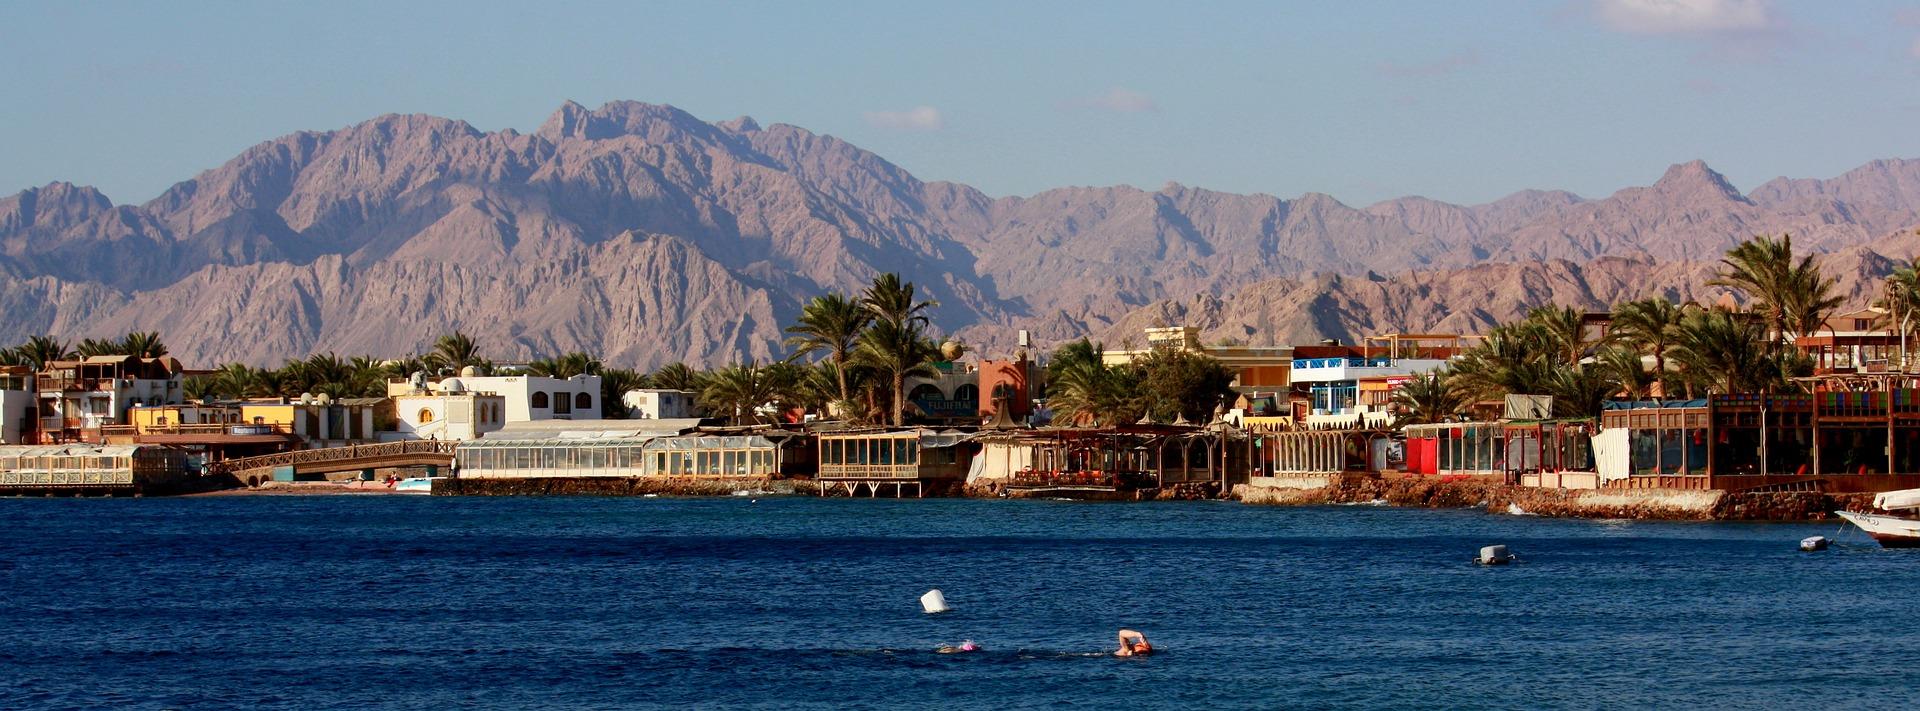 Egypte Sharm El Sheikh vakantie